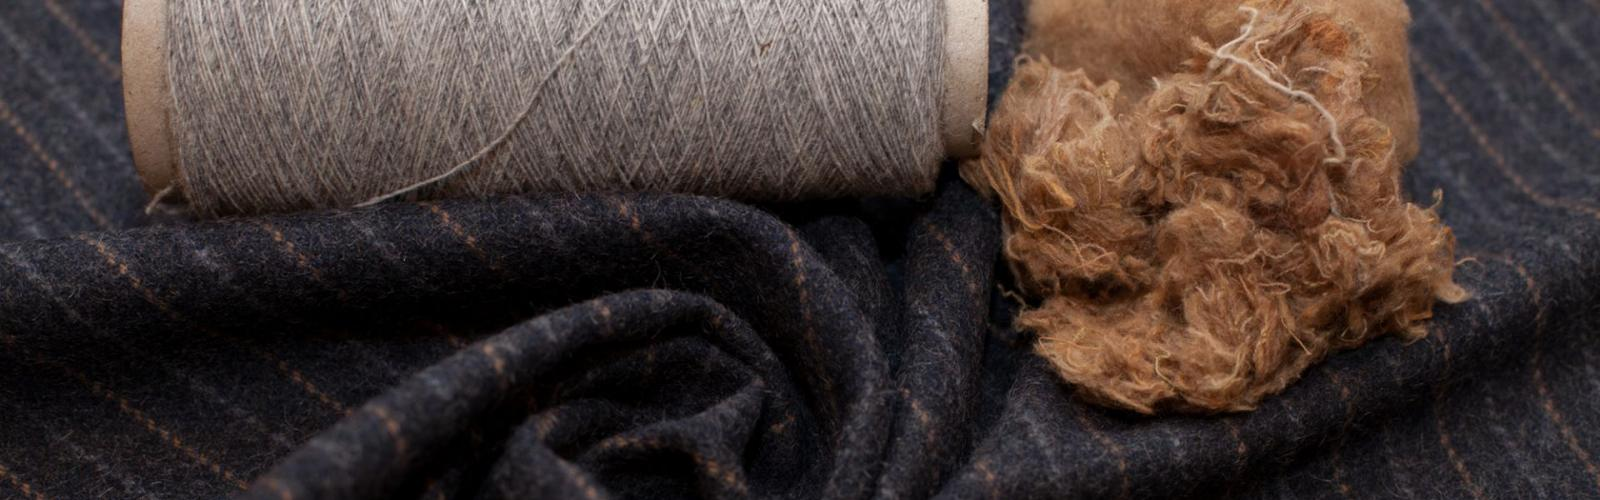 textielvezels